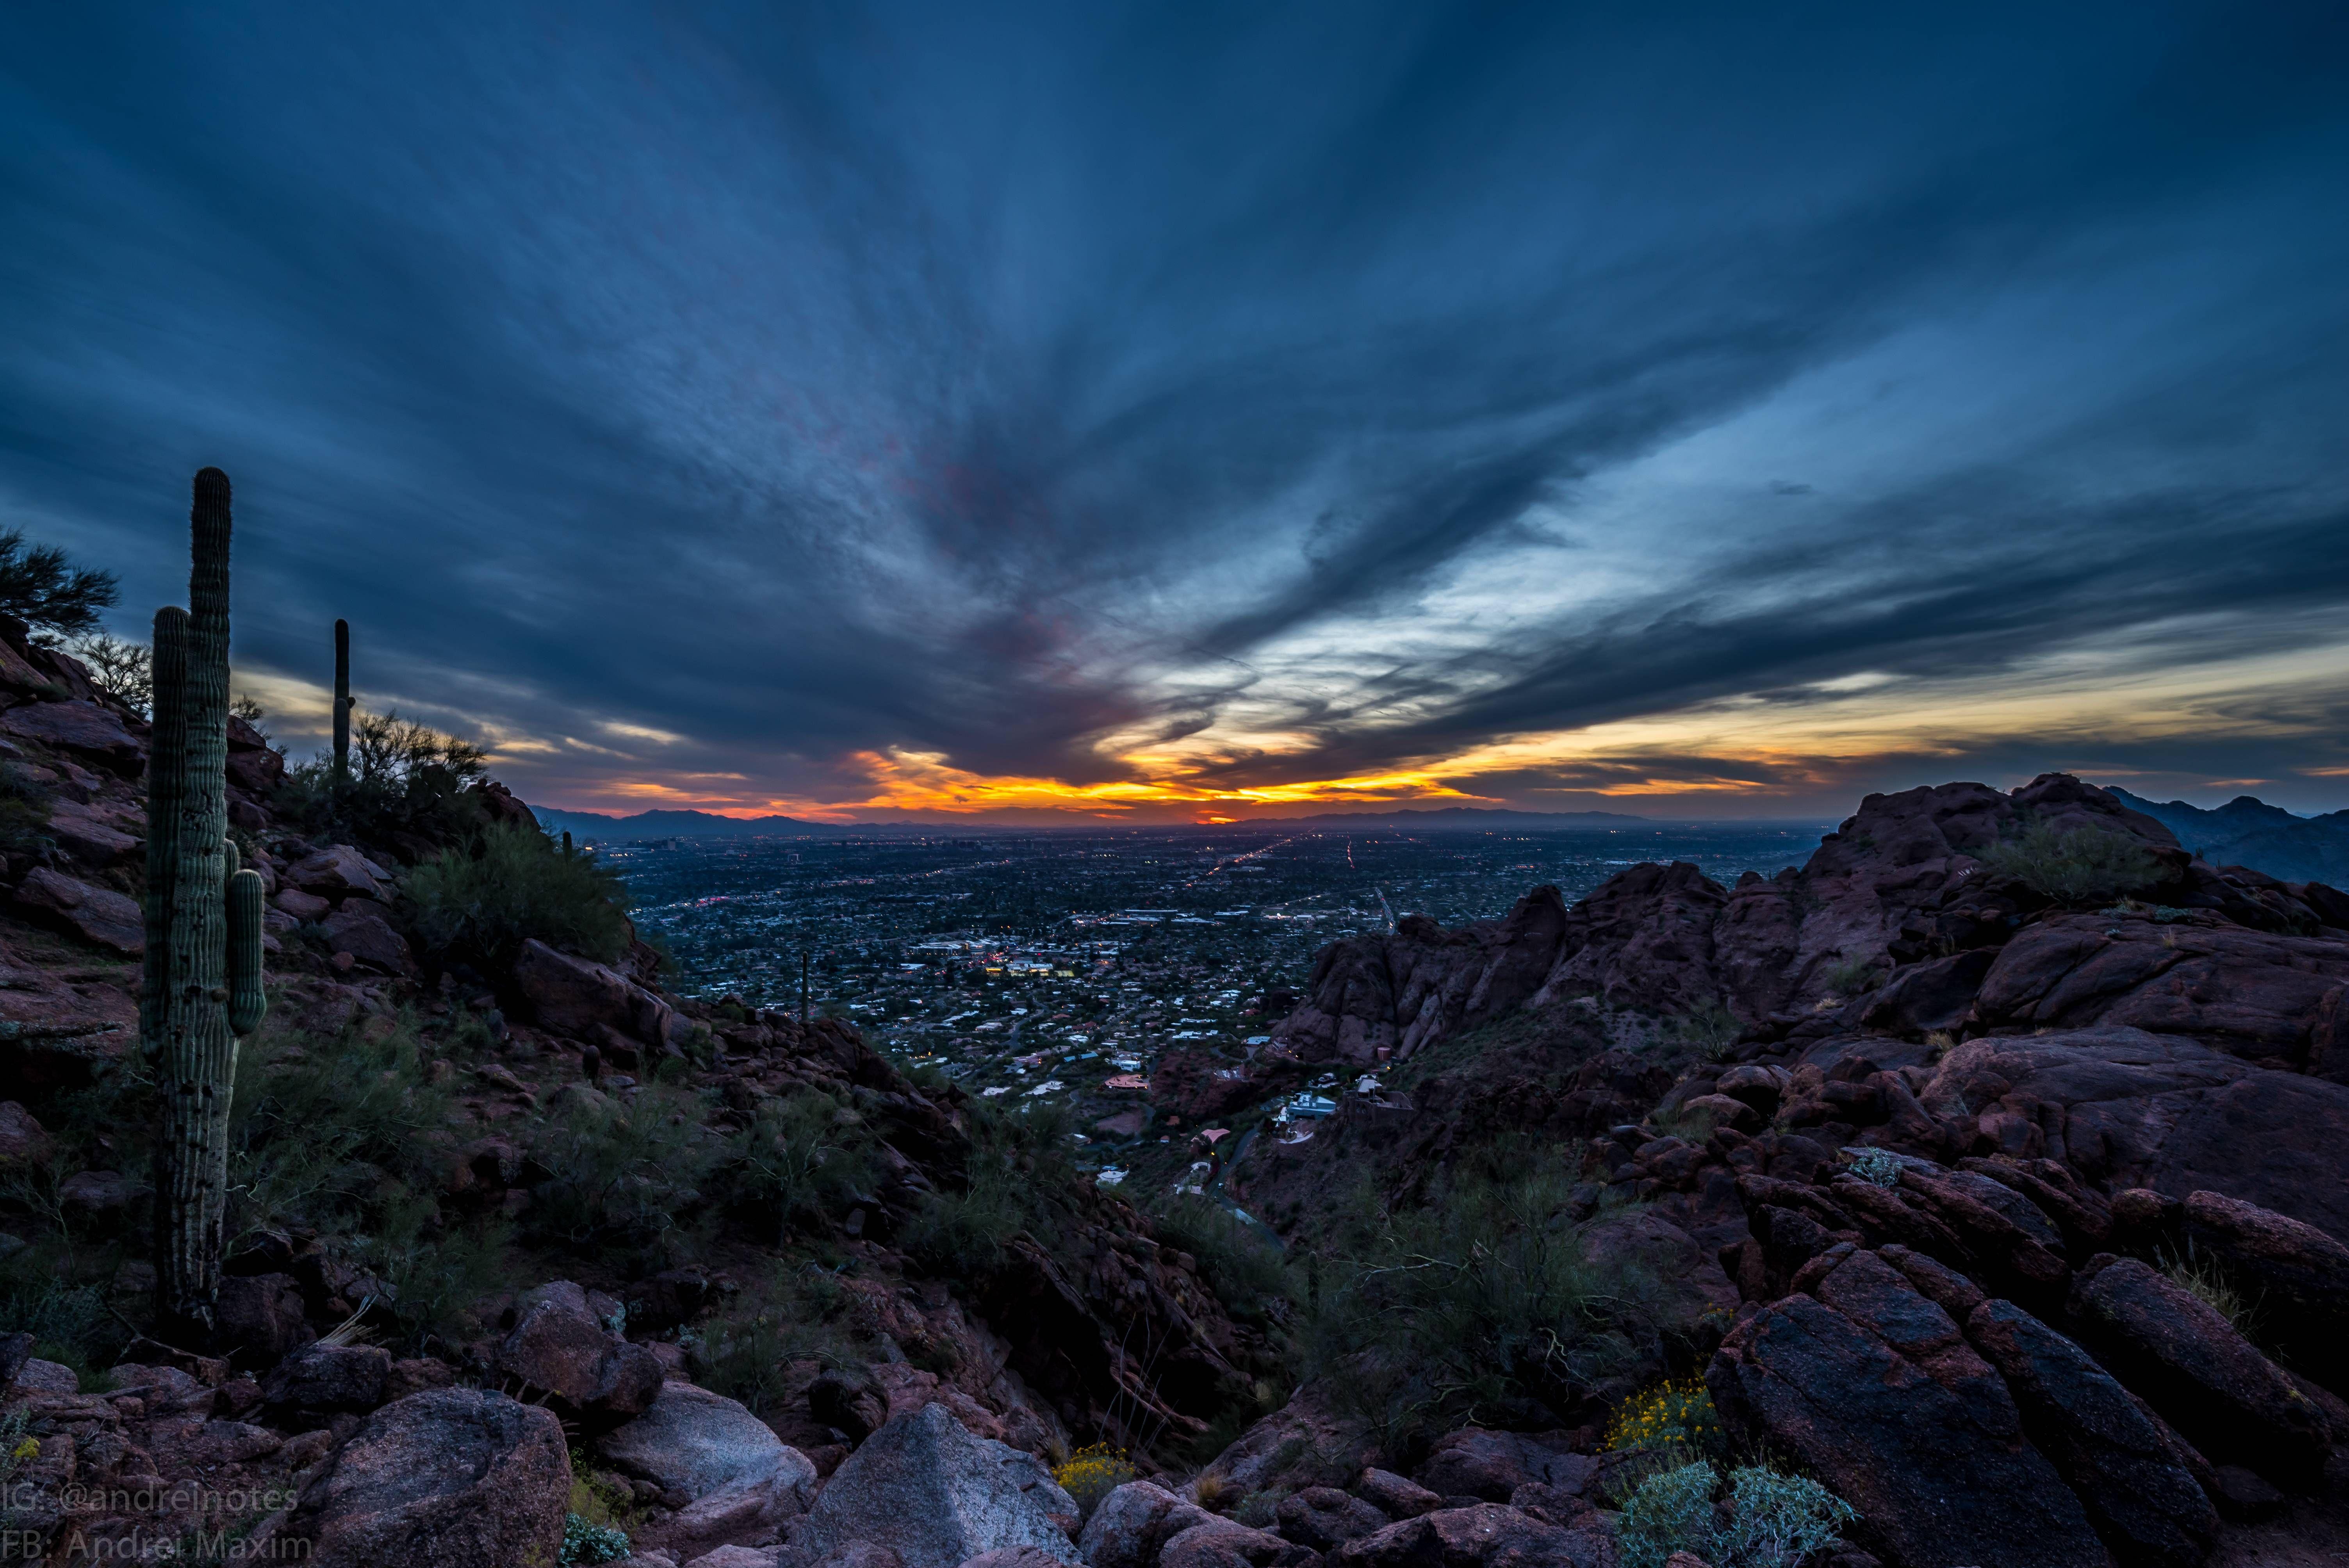 wallpaper sunset mountain arizona - photo #11